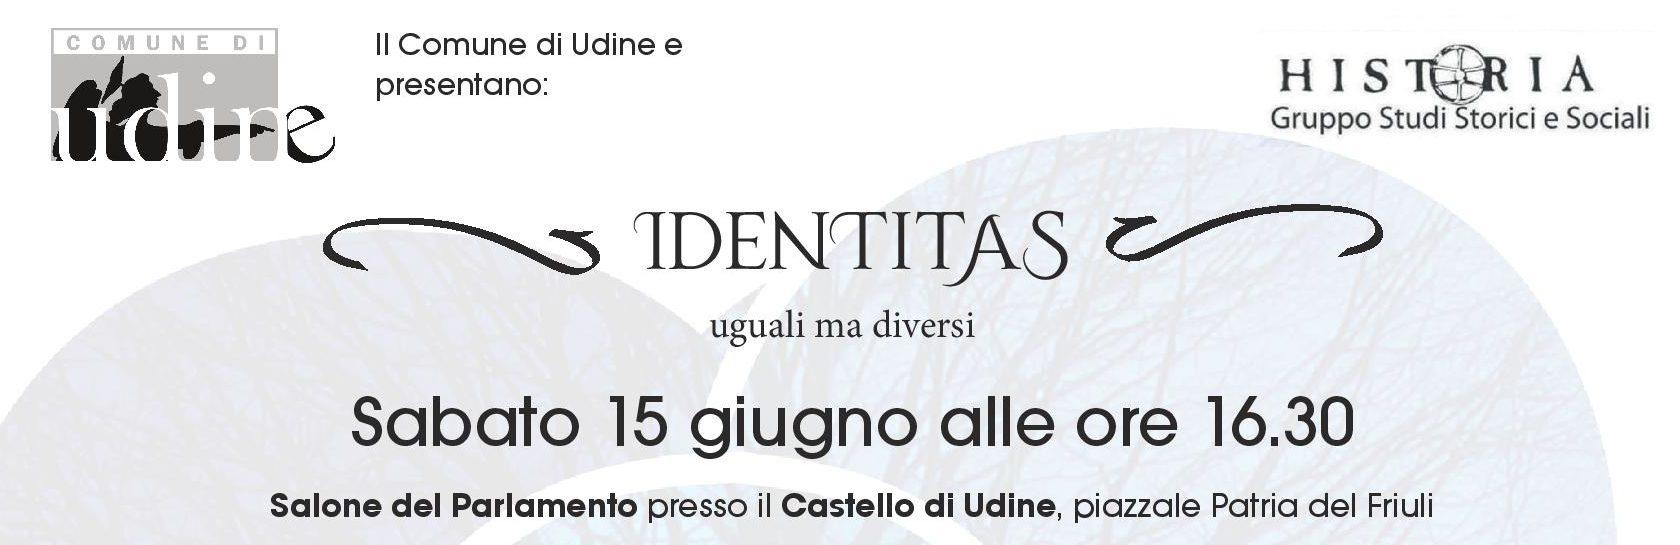 Da Alexandr Dugin a Noam Chomsky, ad Udine un incontro internazionale sul tema dell'Identità, a cura di Emanuele Franz